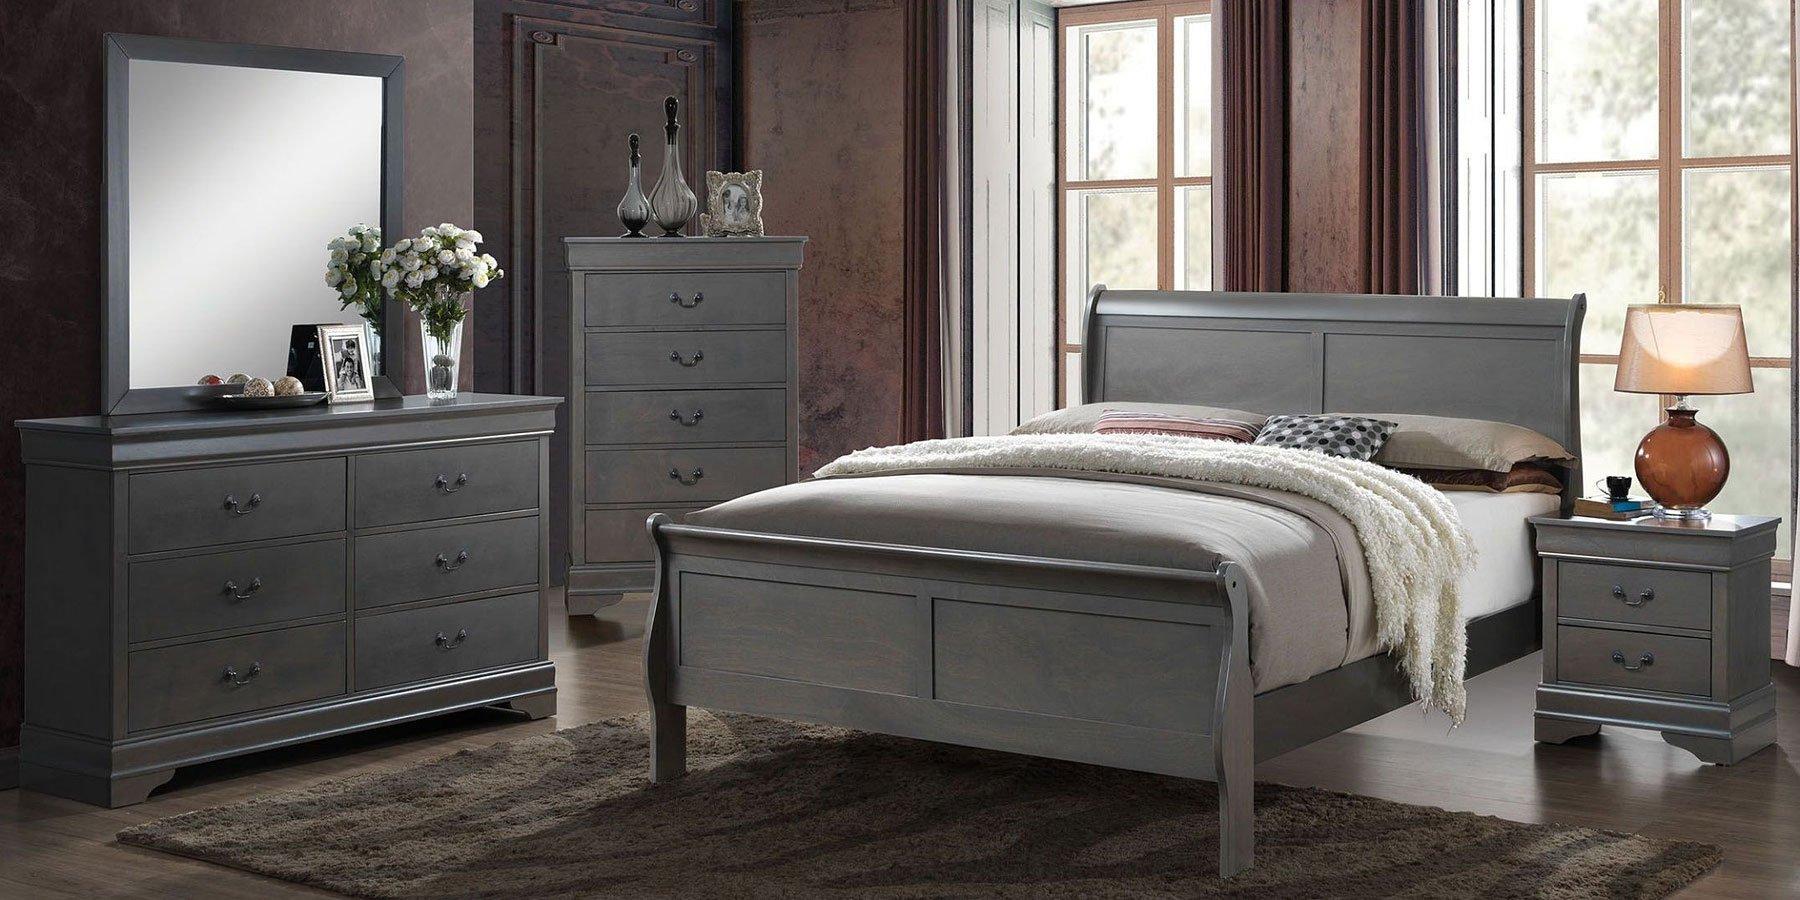 Louis Philippe Bedroom Set (Gray)